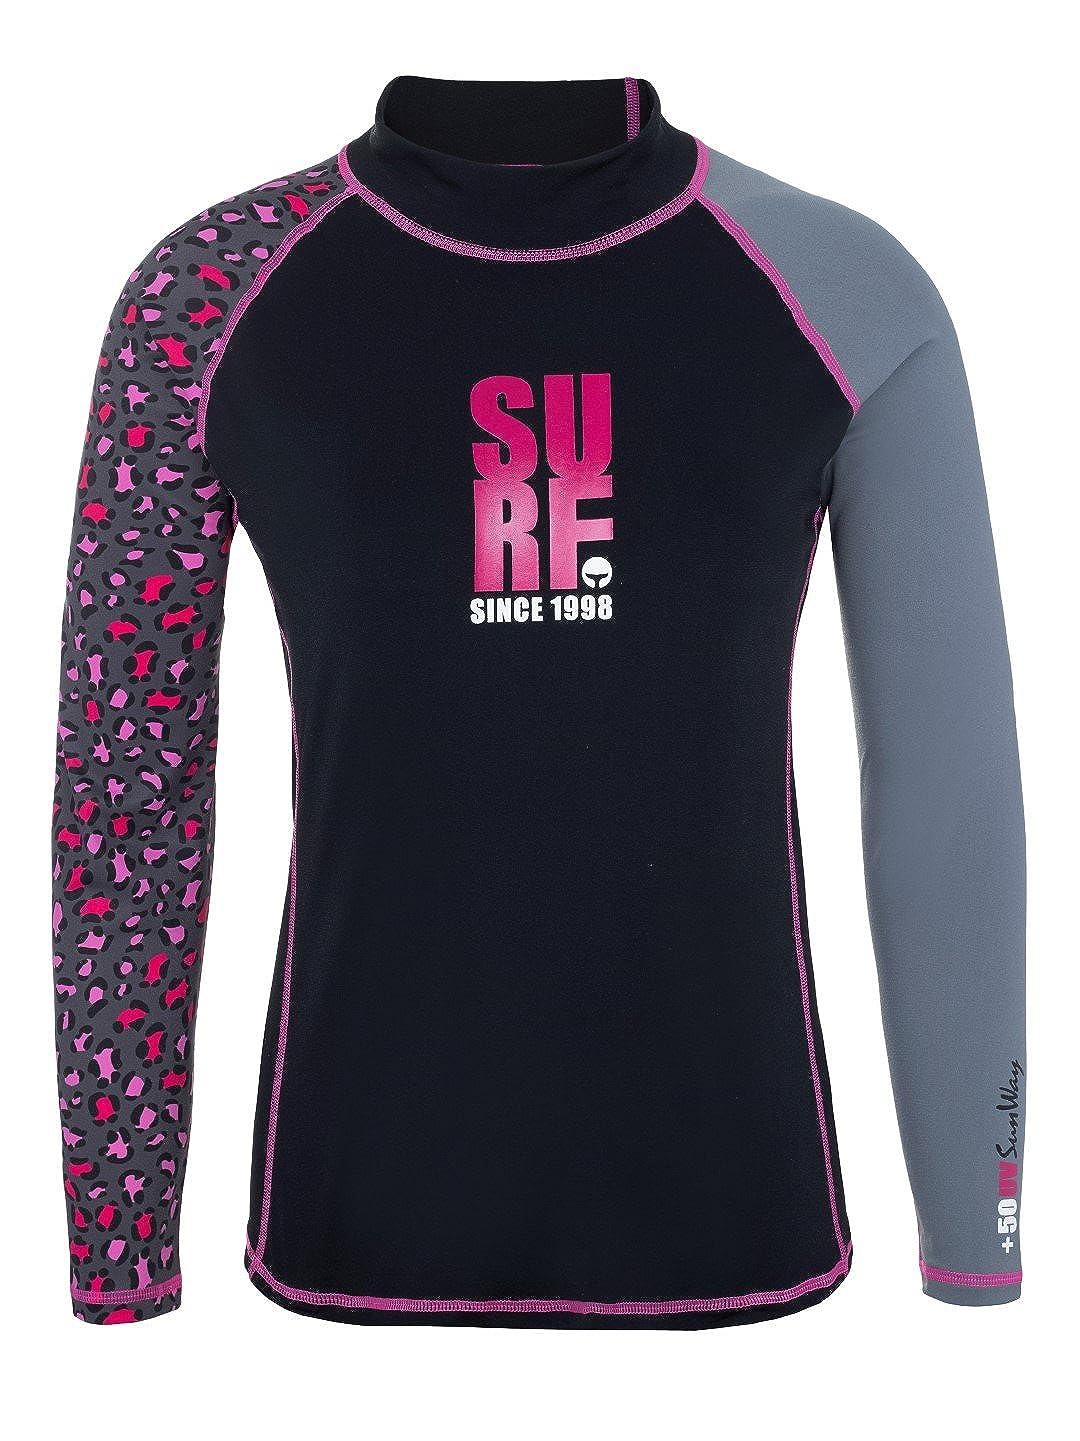 Sunway Surfing Women's Rash Guard Swim Shirt UV Sun Predectionn UPF 50+